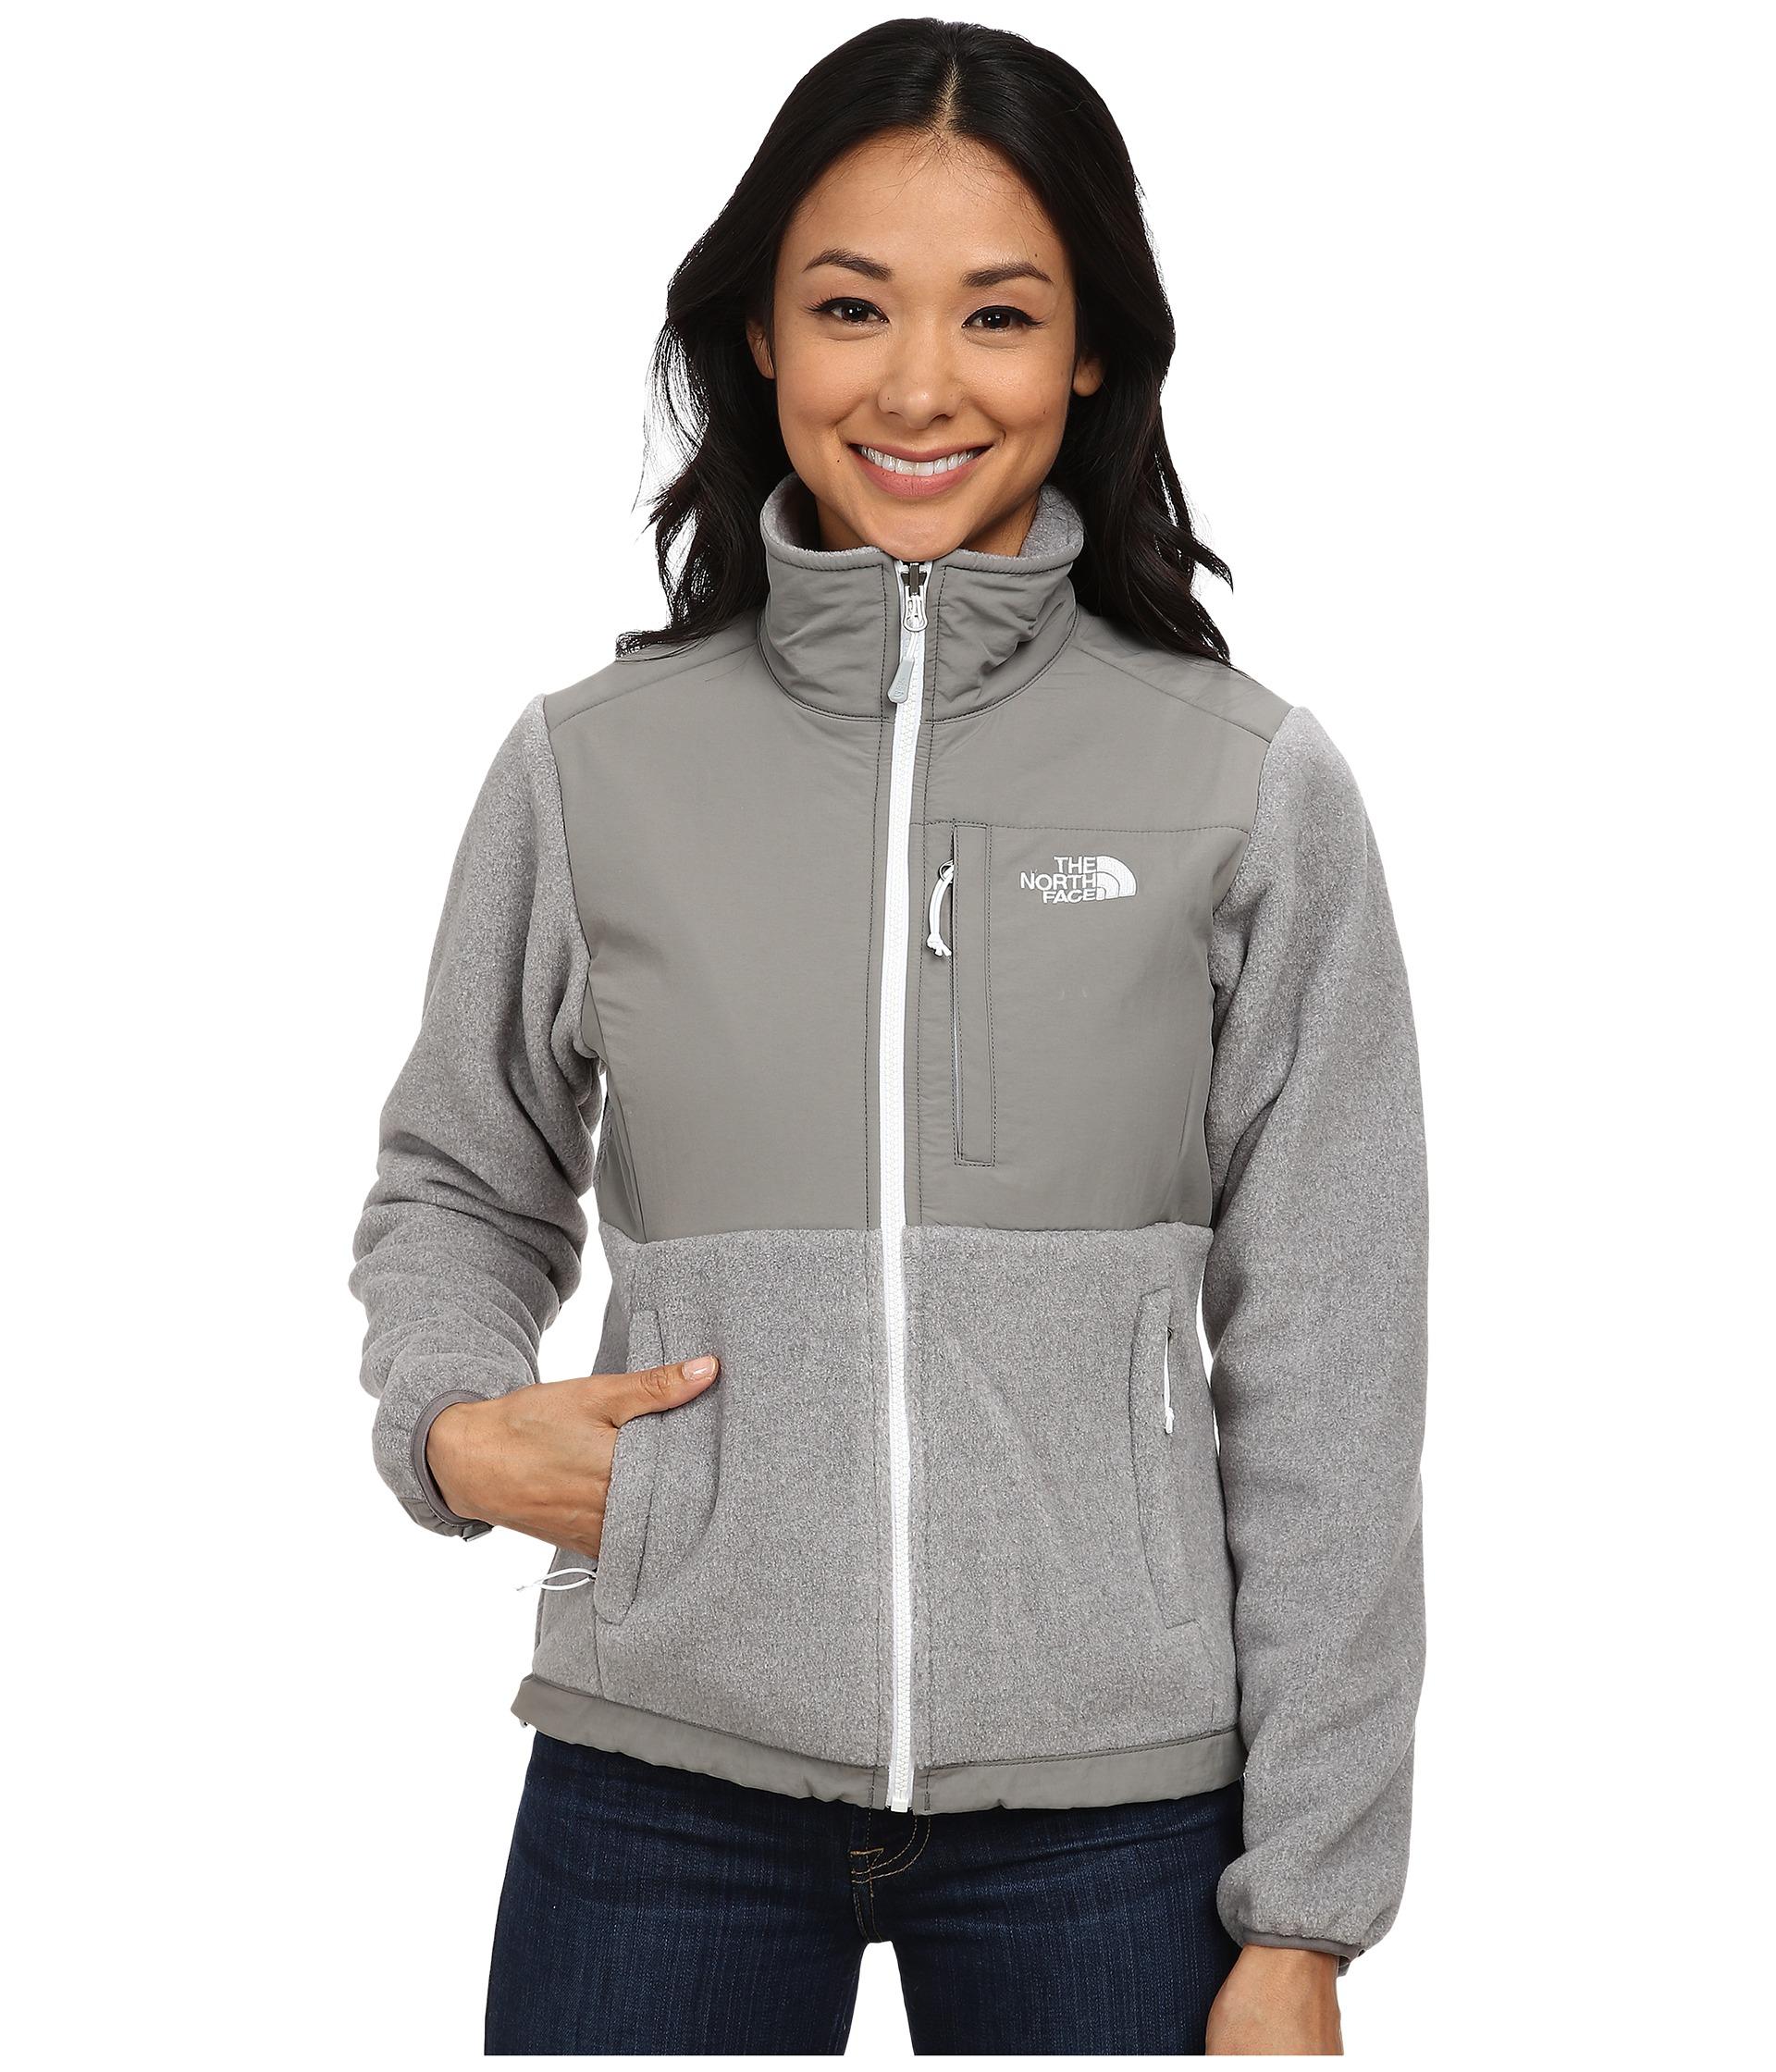 ... shopping lyst the north face denali jacket in gray 33687 6cb43 adb7abc9d